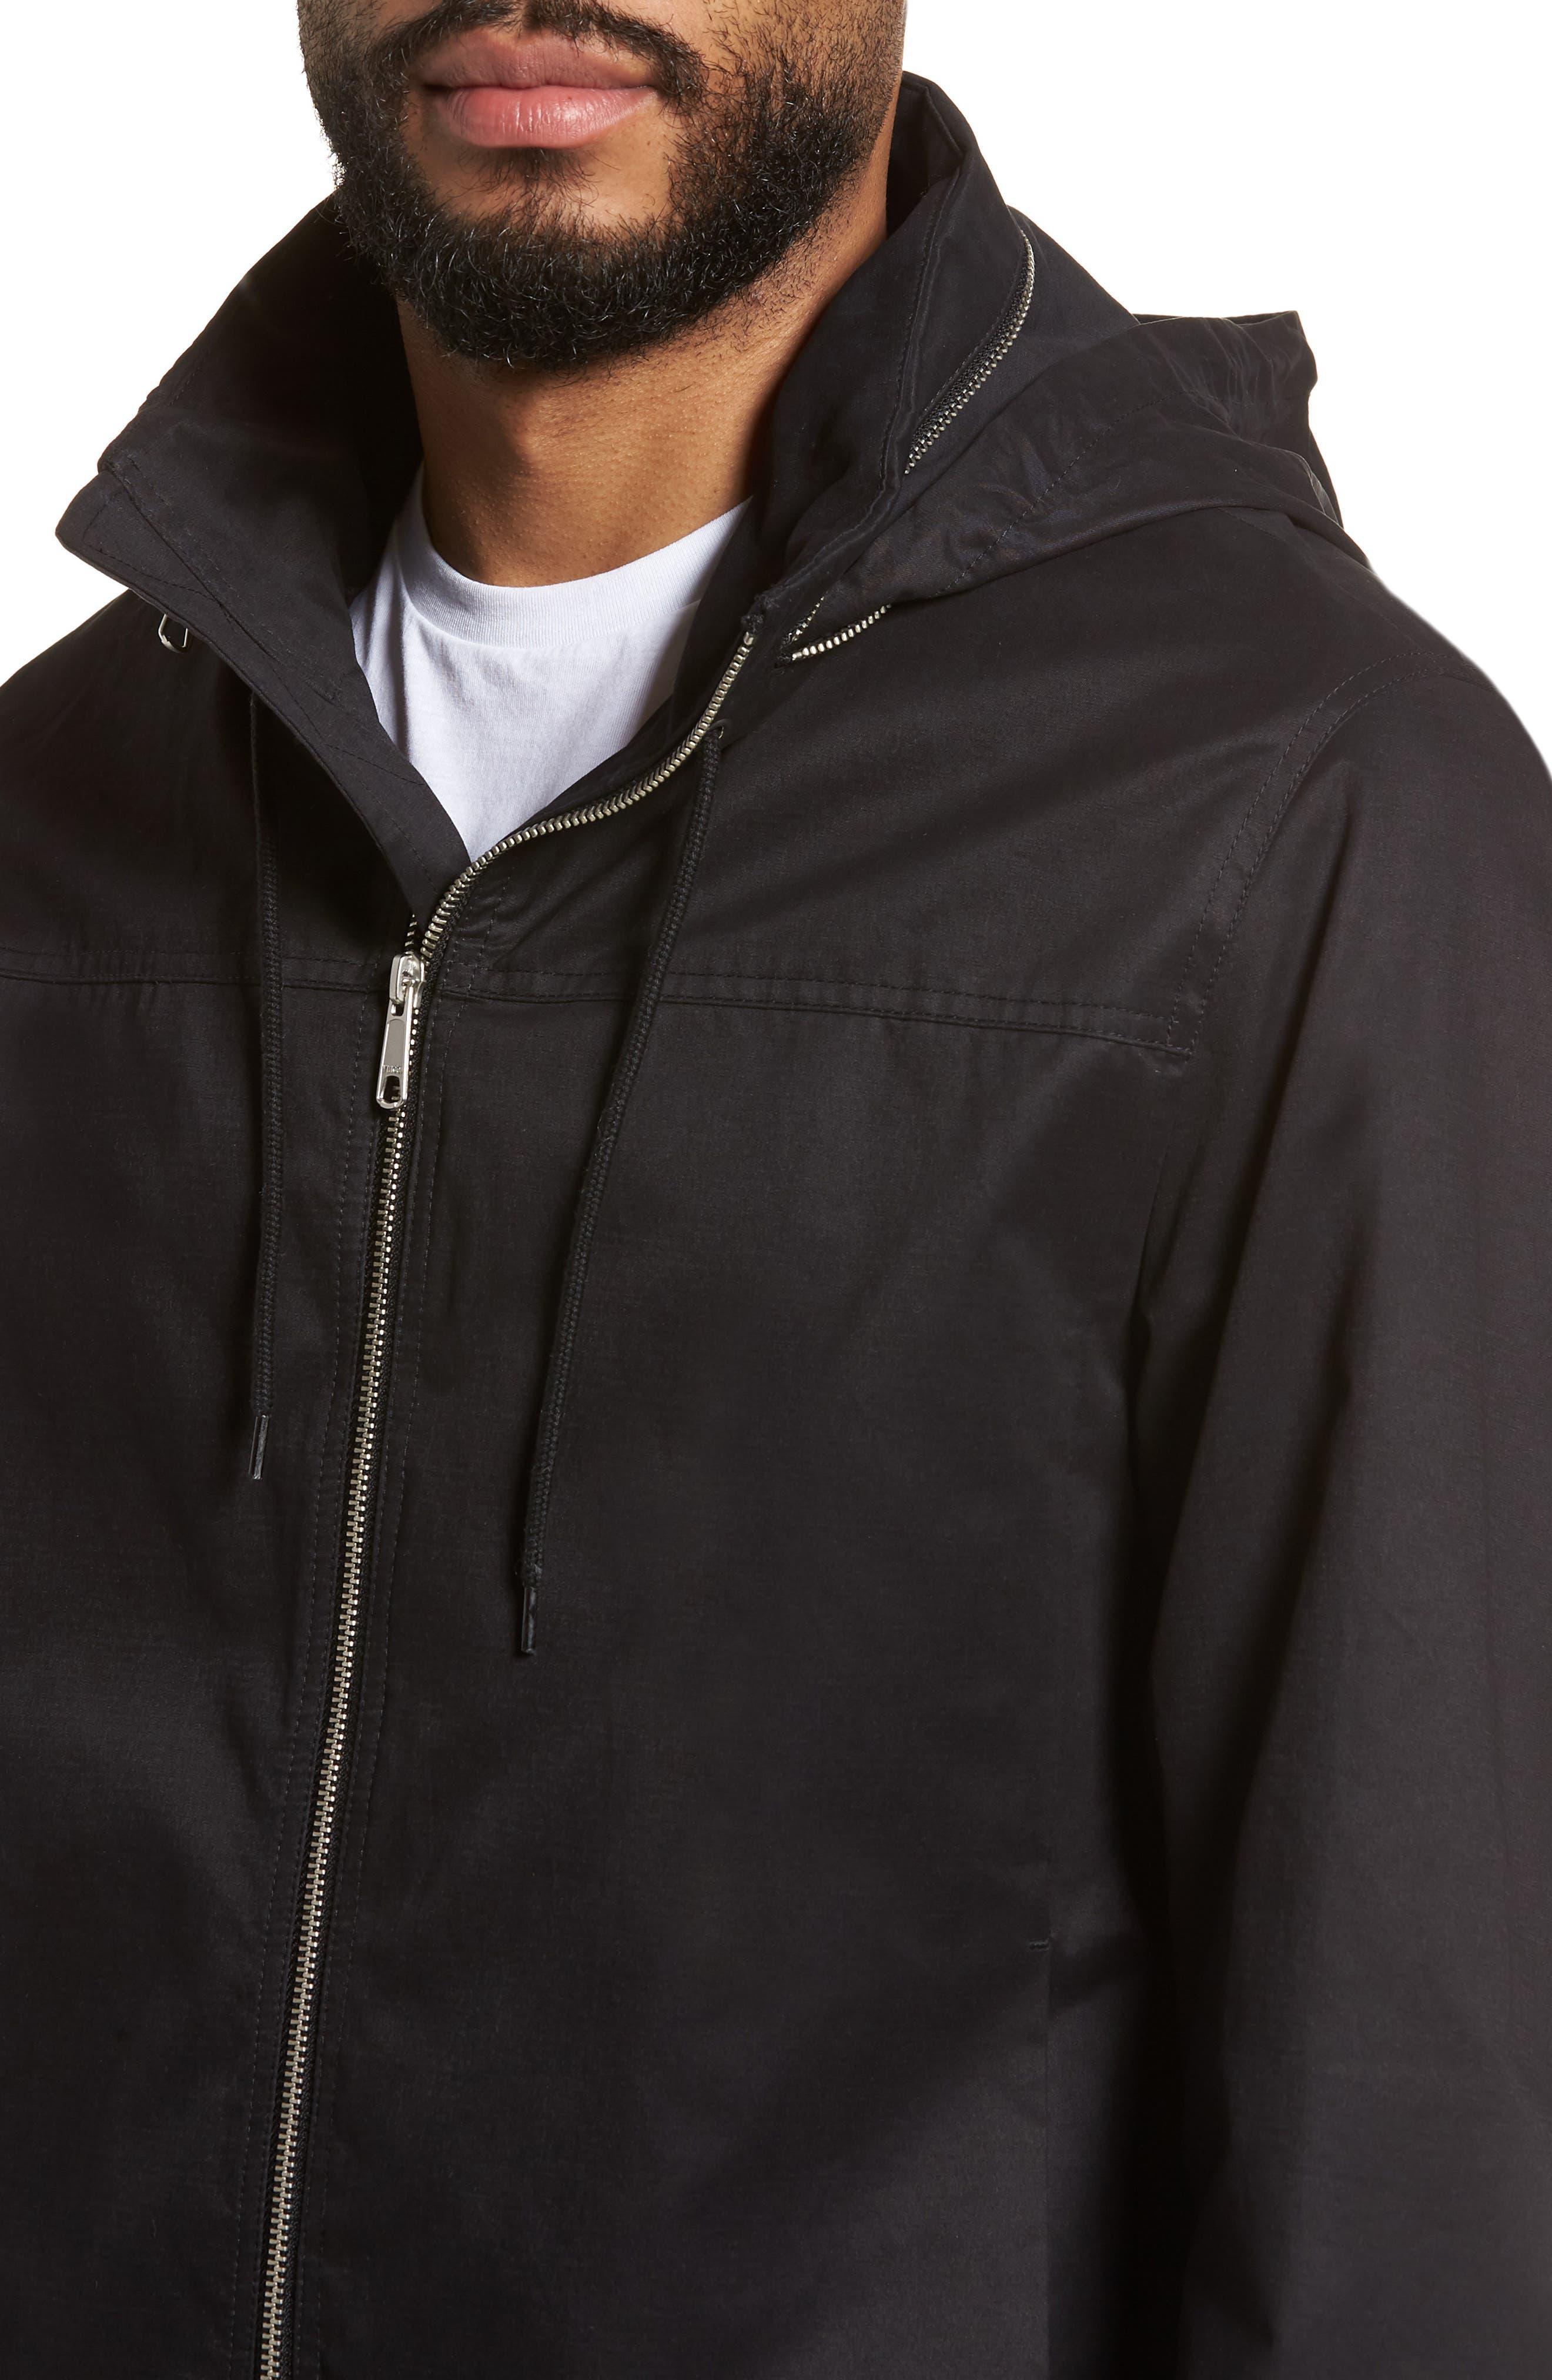 Regular Fit Hooded Jacket,                             Alternate thumbnail 4, color,                             001